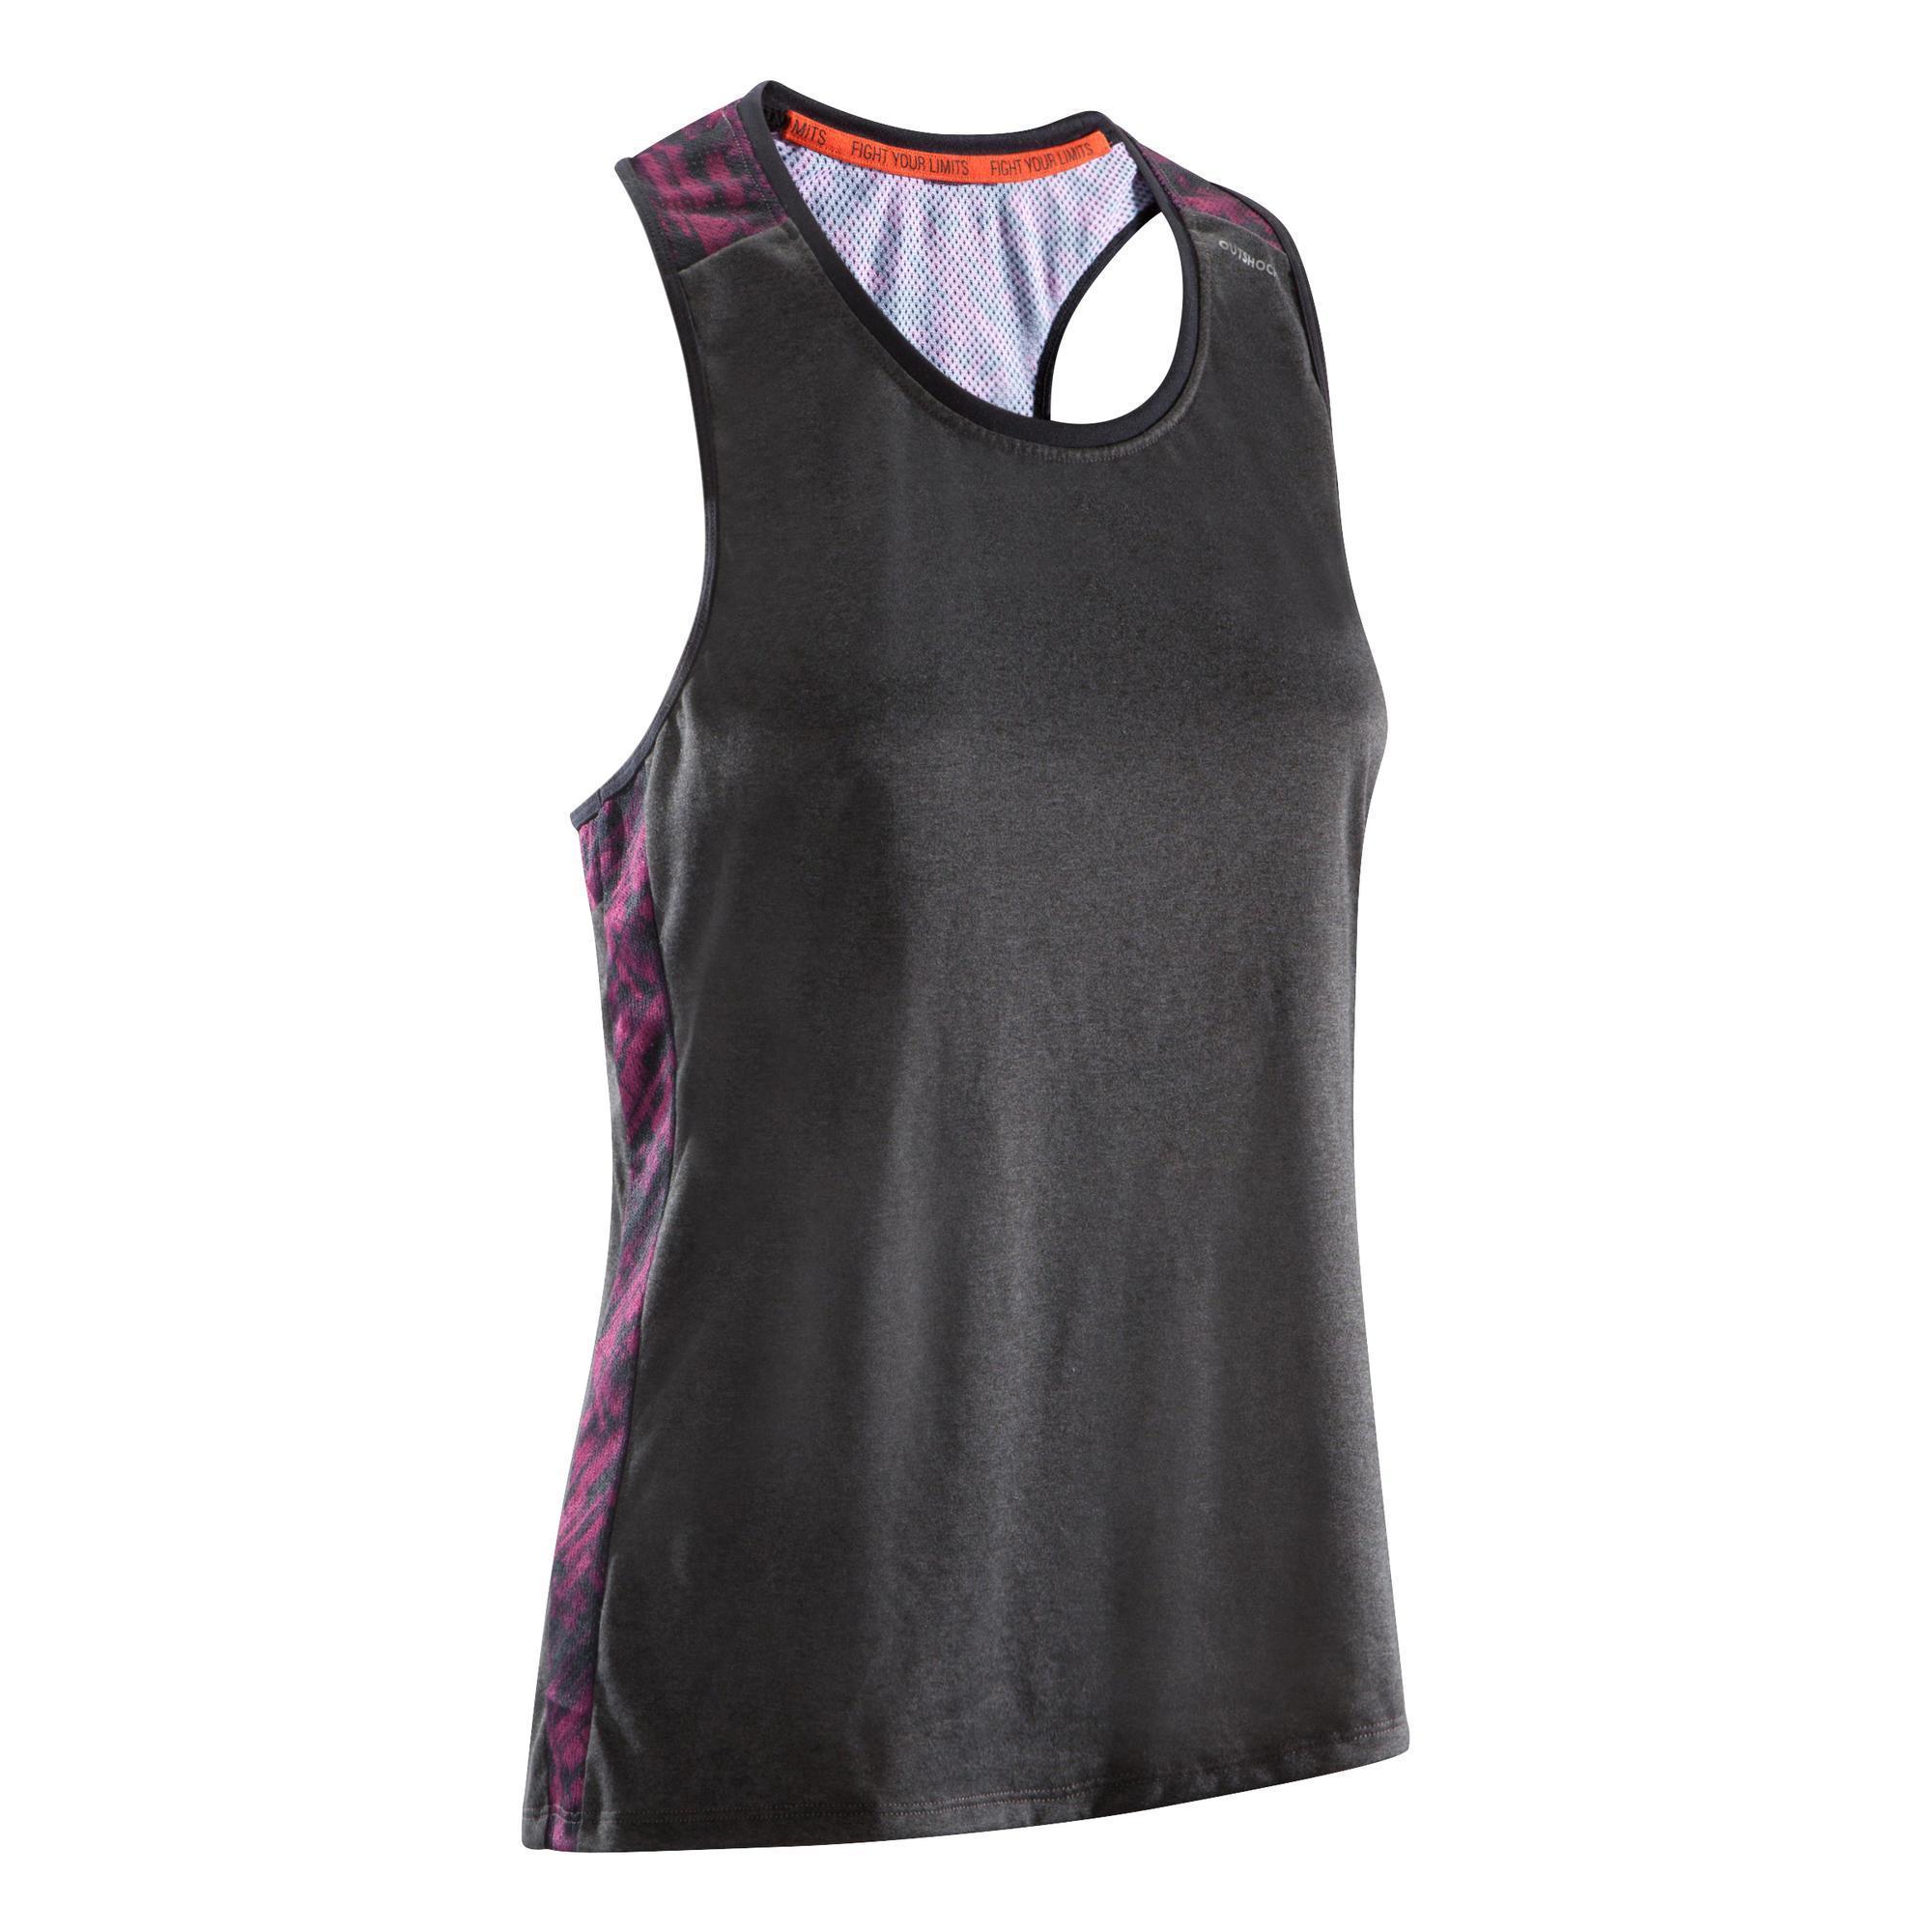 Outshock Mouwloos boksshirt 500 dames, licht en ademend